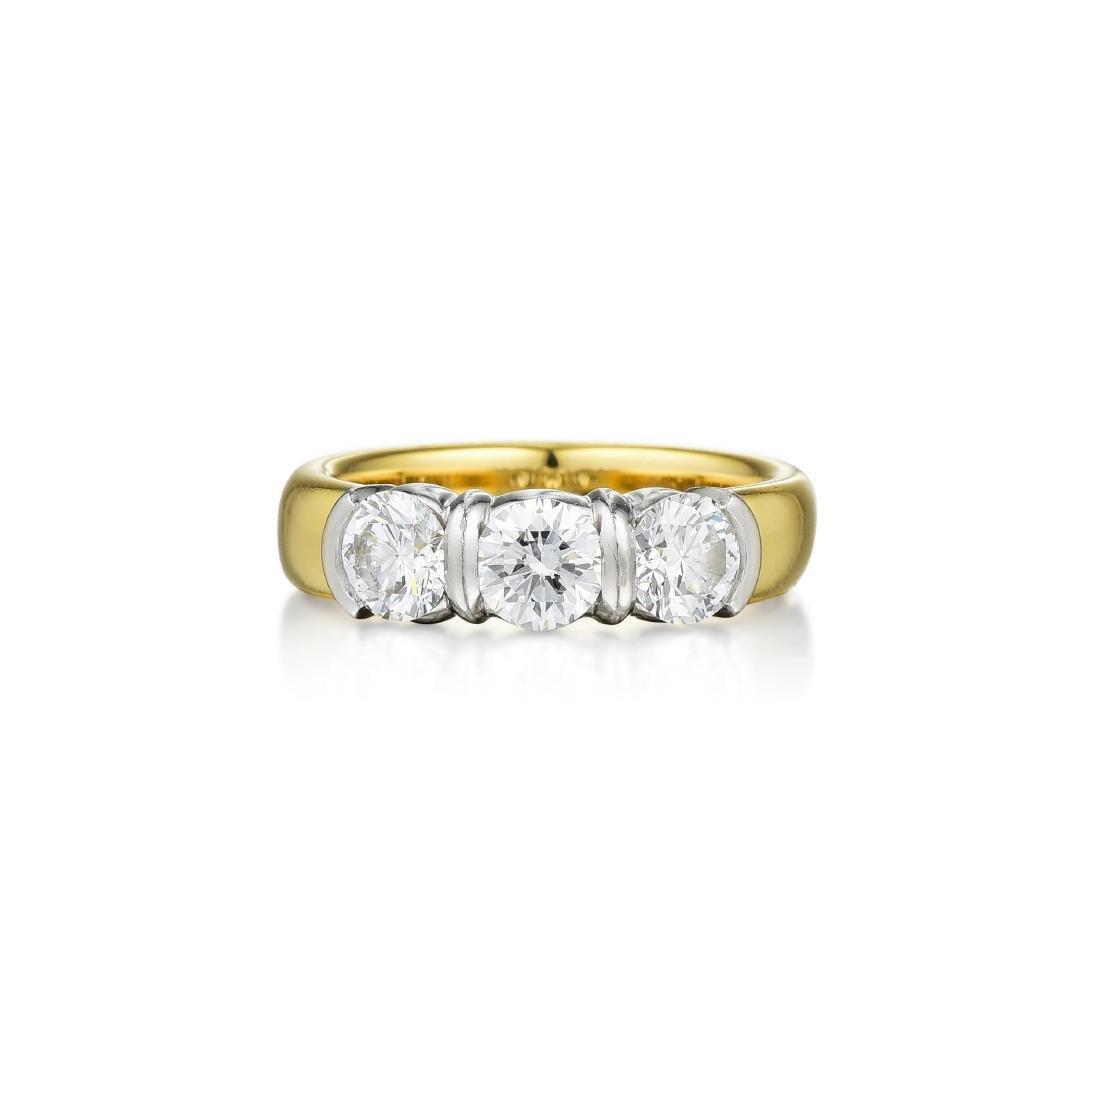 Tiffany & Co. Etoile Three Stone Diamond Ring